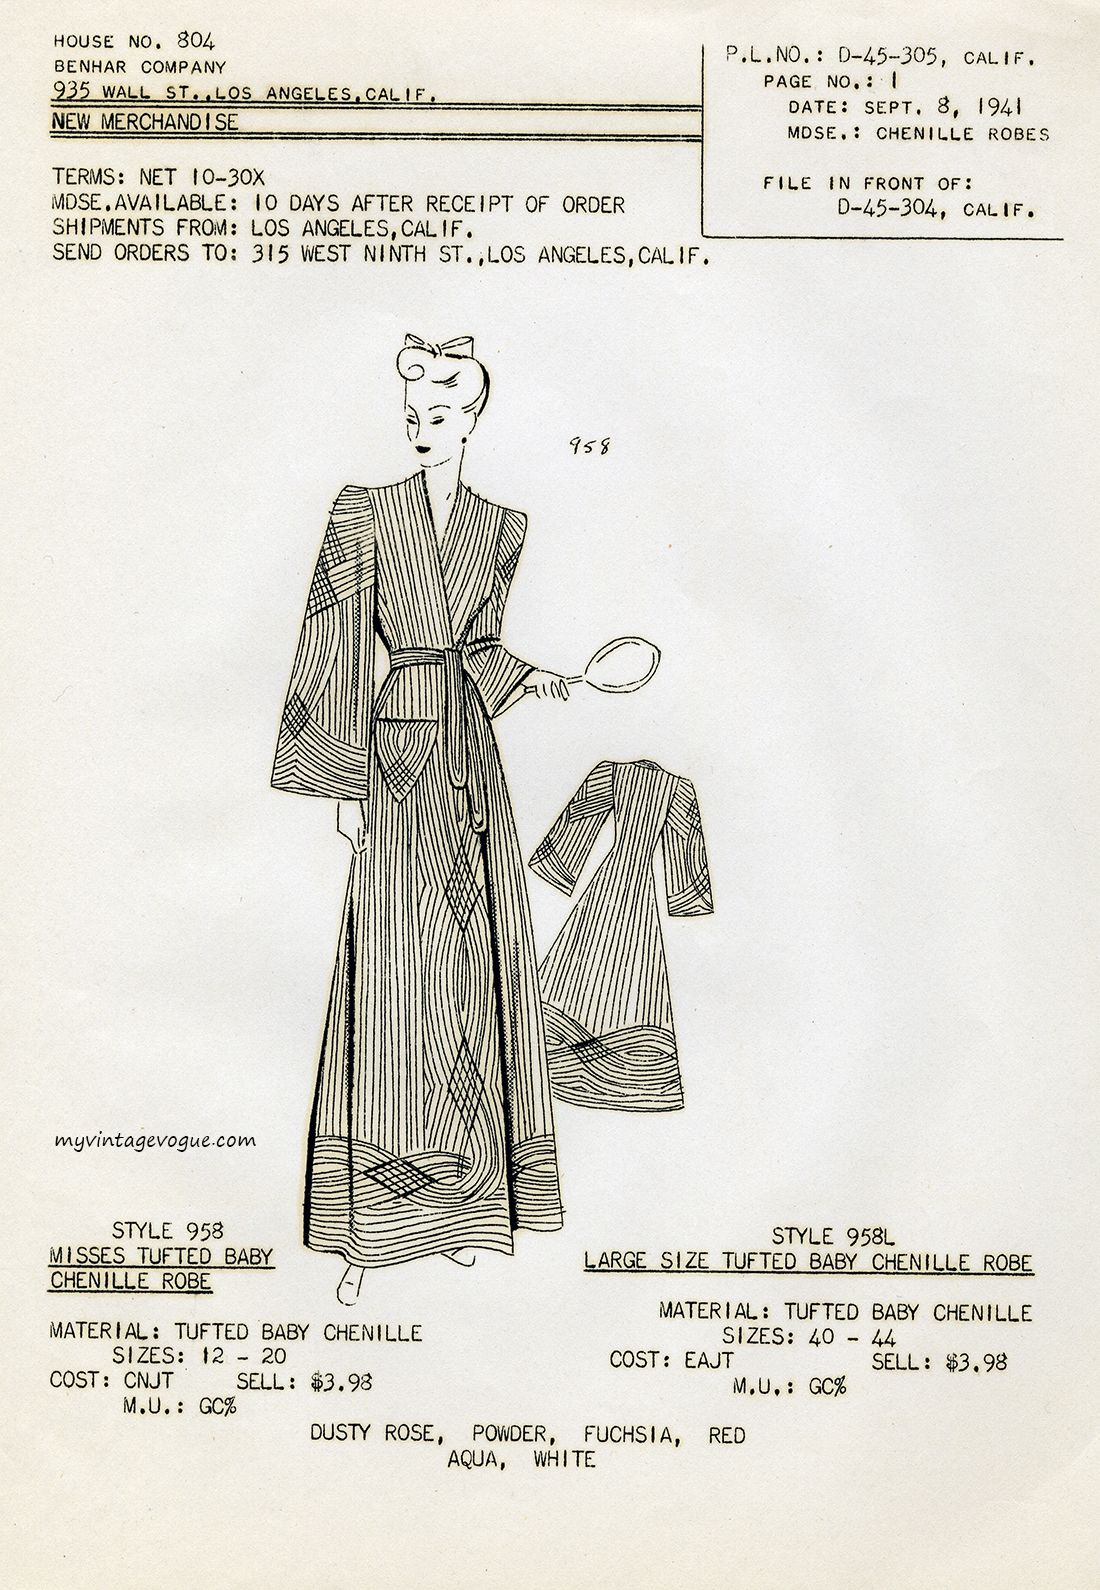 1941 Fashion Style | Benhar Company 1941 | WWII Era Fashions